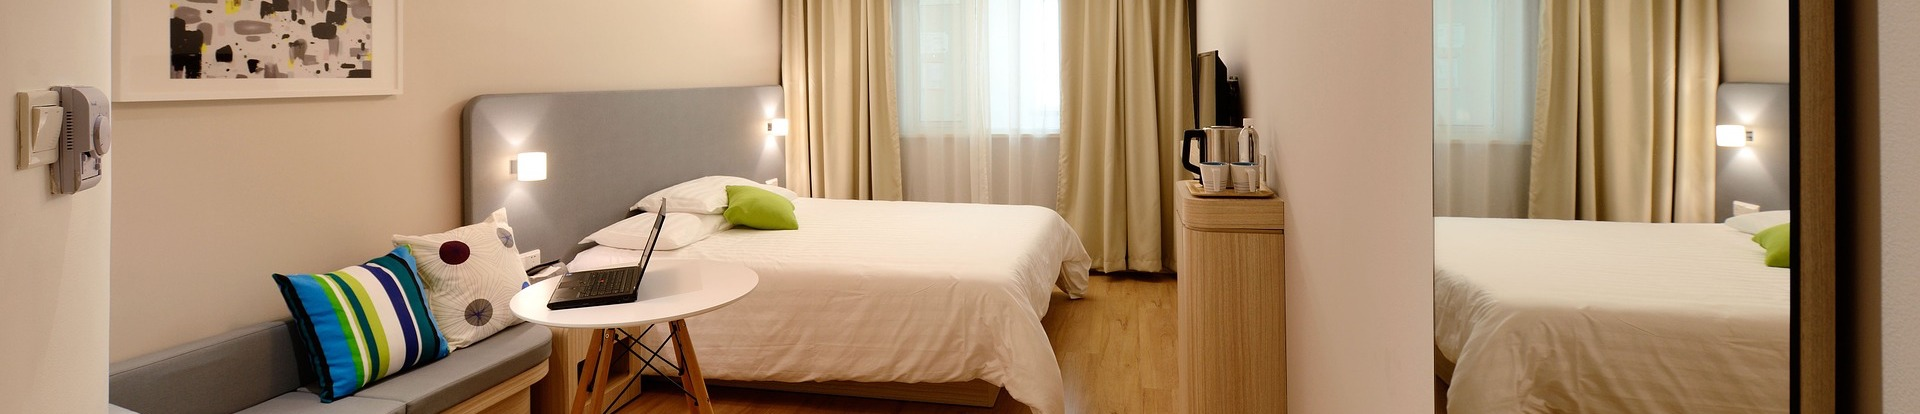 Hotel 1330841 1920